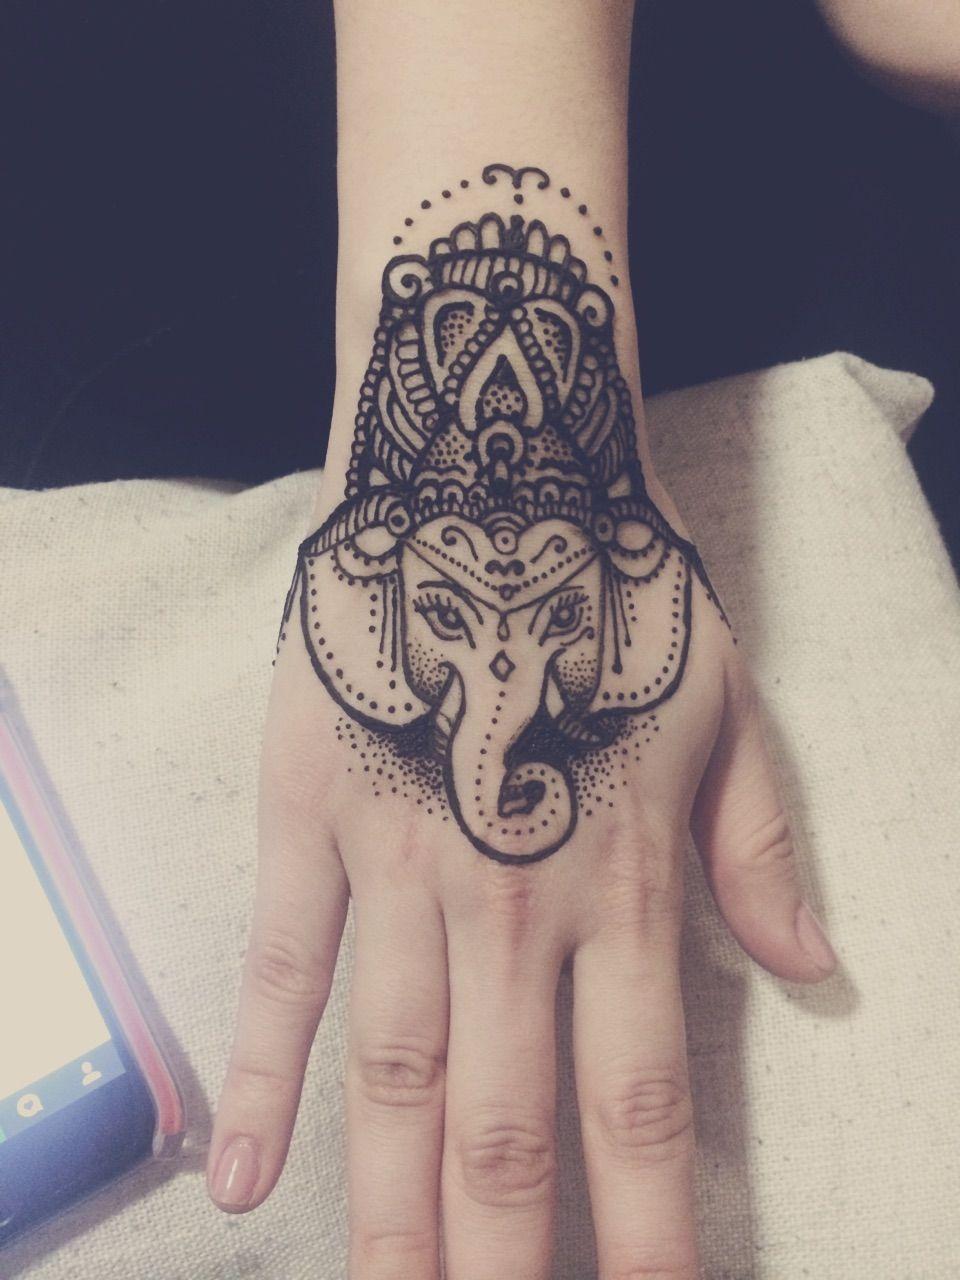 henna tumblr henna designs pinterest hennas tattoo and henna designs. Black Bedroom Furniture Sets. Home Design Ideas